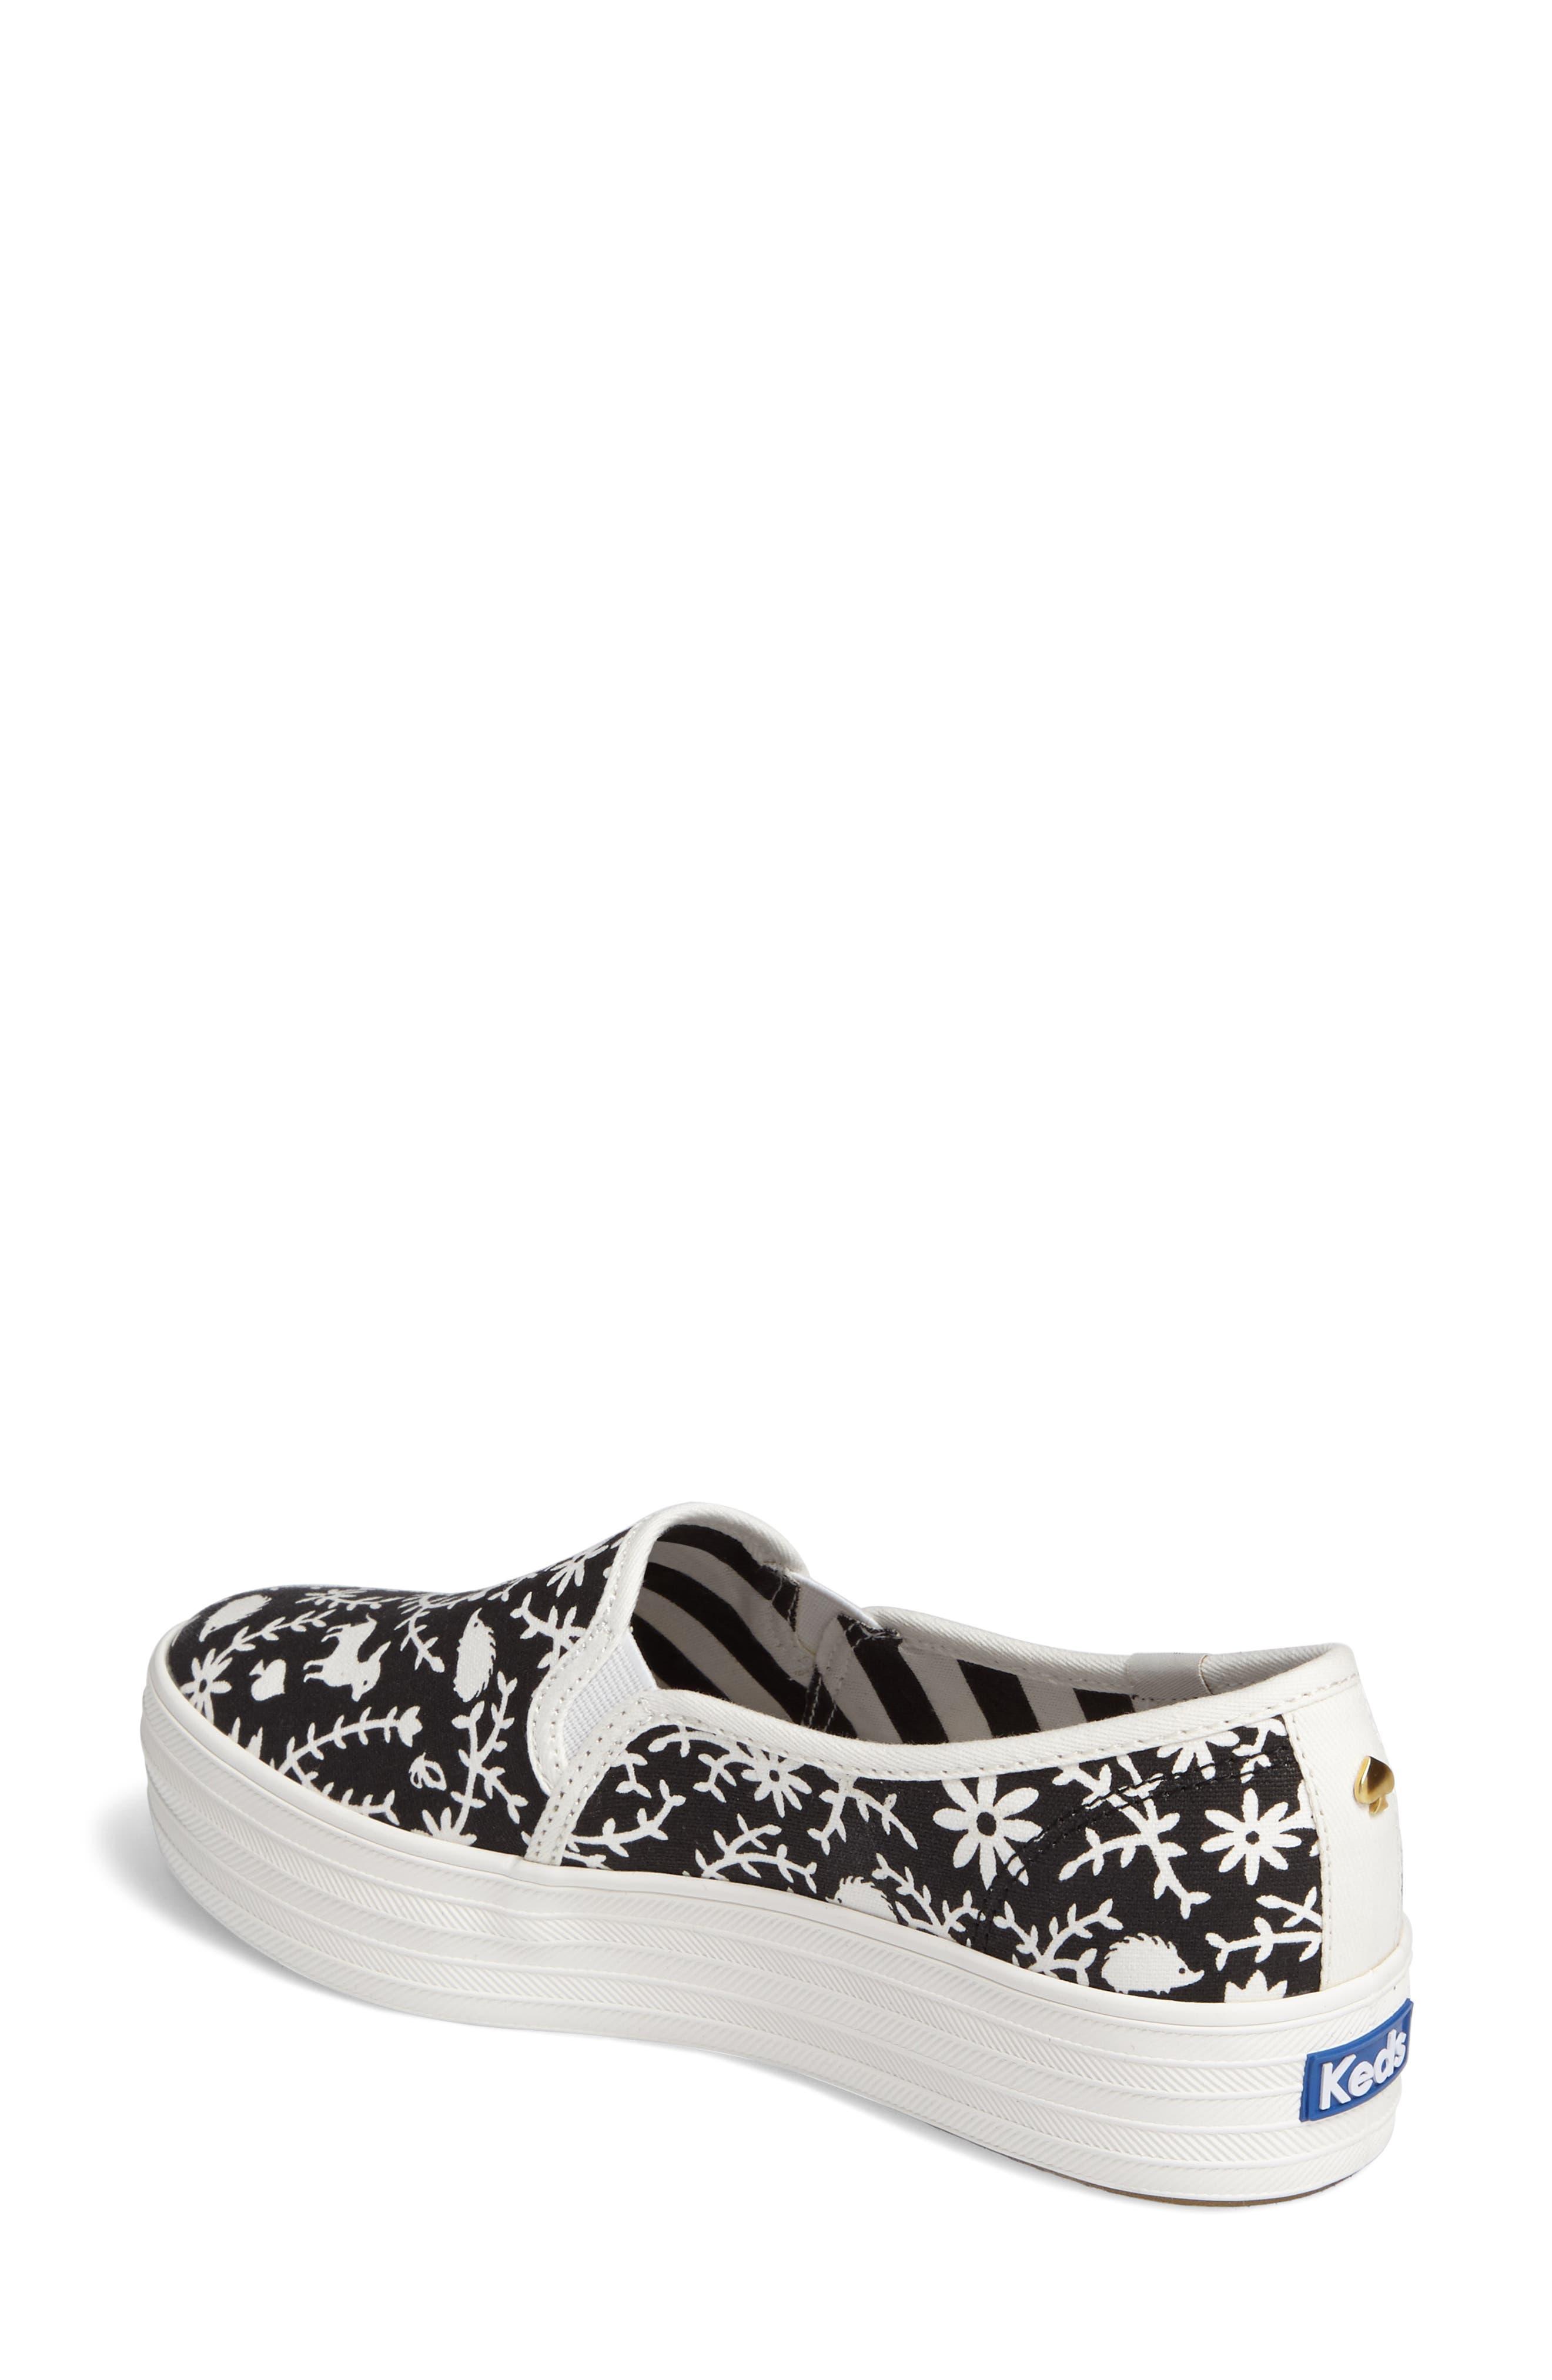 Keds<sup>®</sup> x kate spade Triple Decker Slip-On Sneaker,                             Alternate thumbnail 3, color,